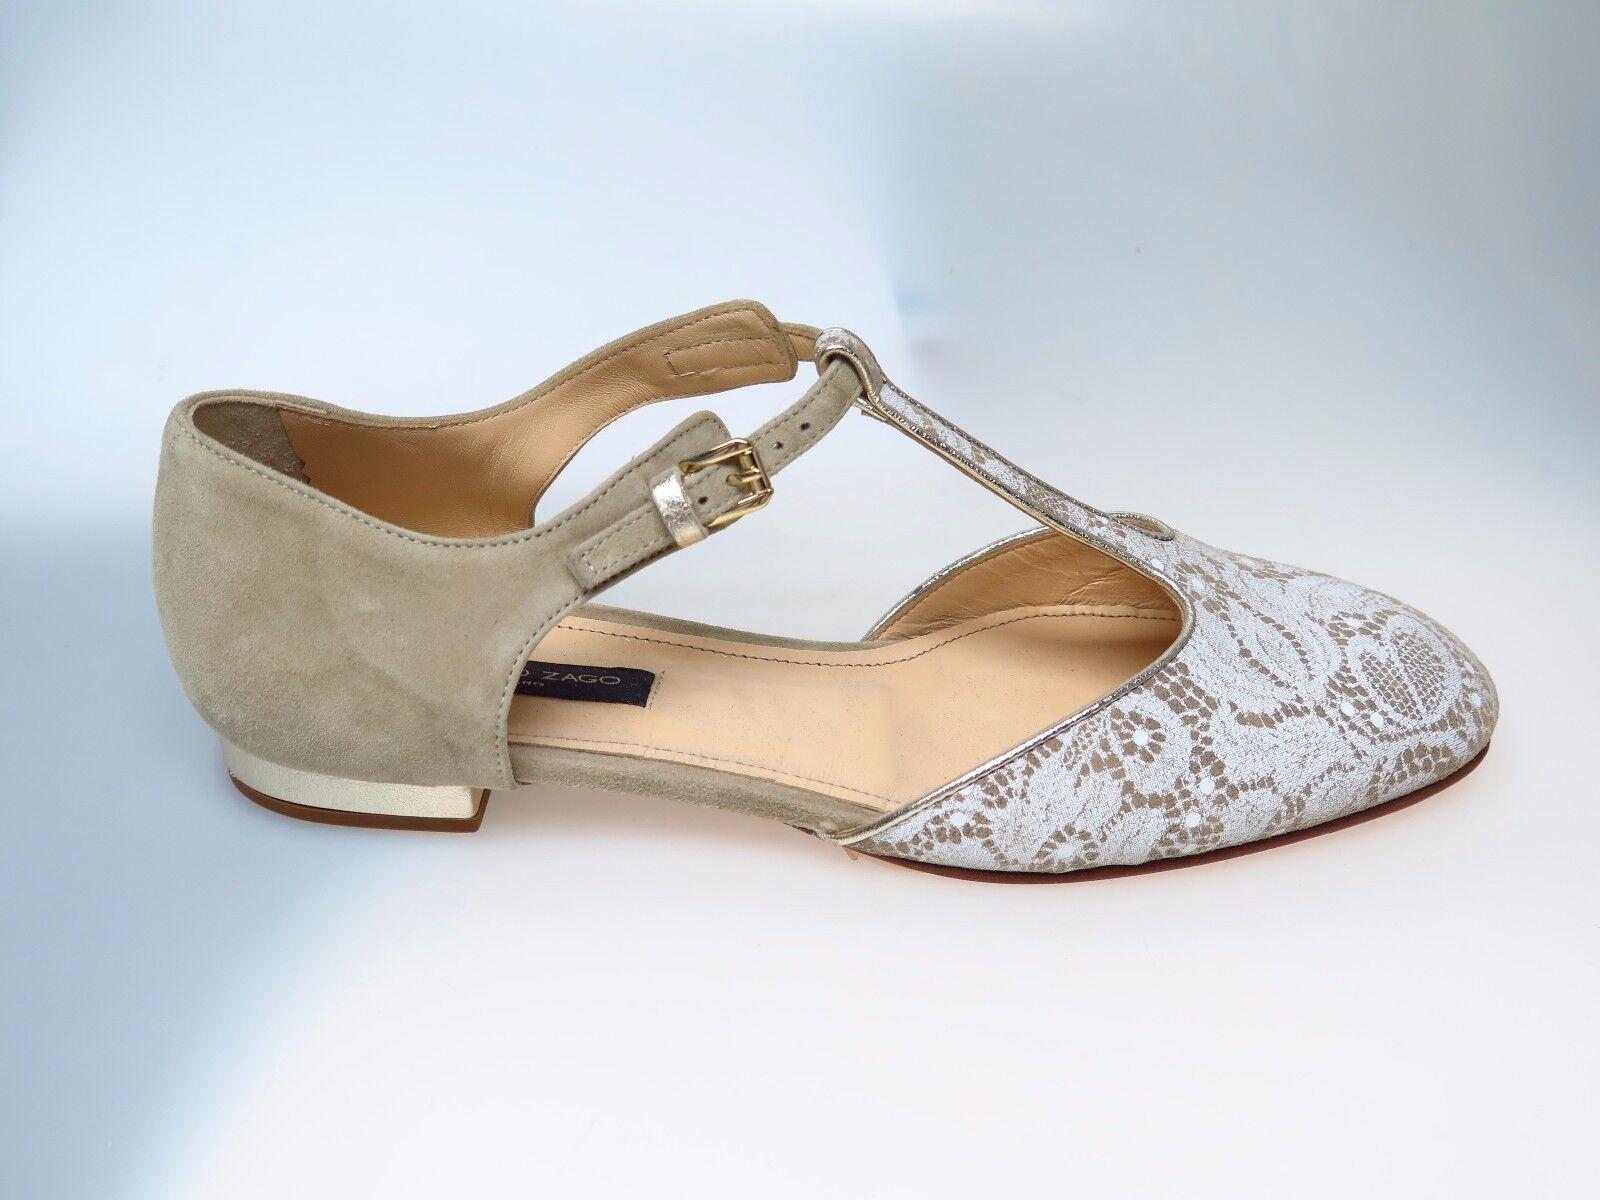 ALBERTO Pizzo ZAGO Damenschuhe Schuhe E33721 Pizzo ALBERTO Camoscio Taupe Gr. EU 38,5 NEU bcf998